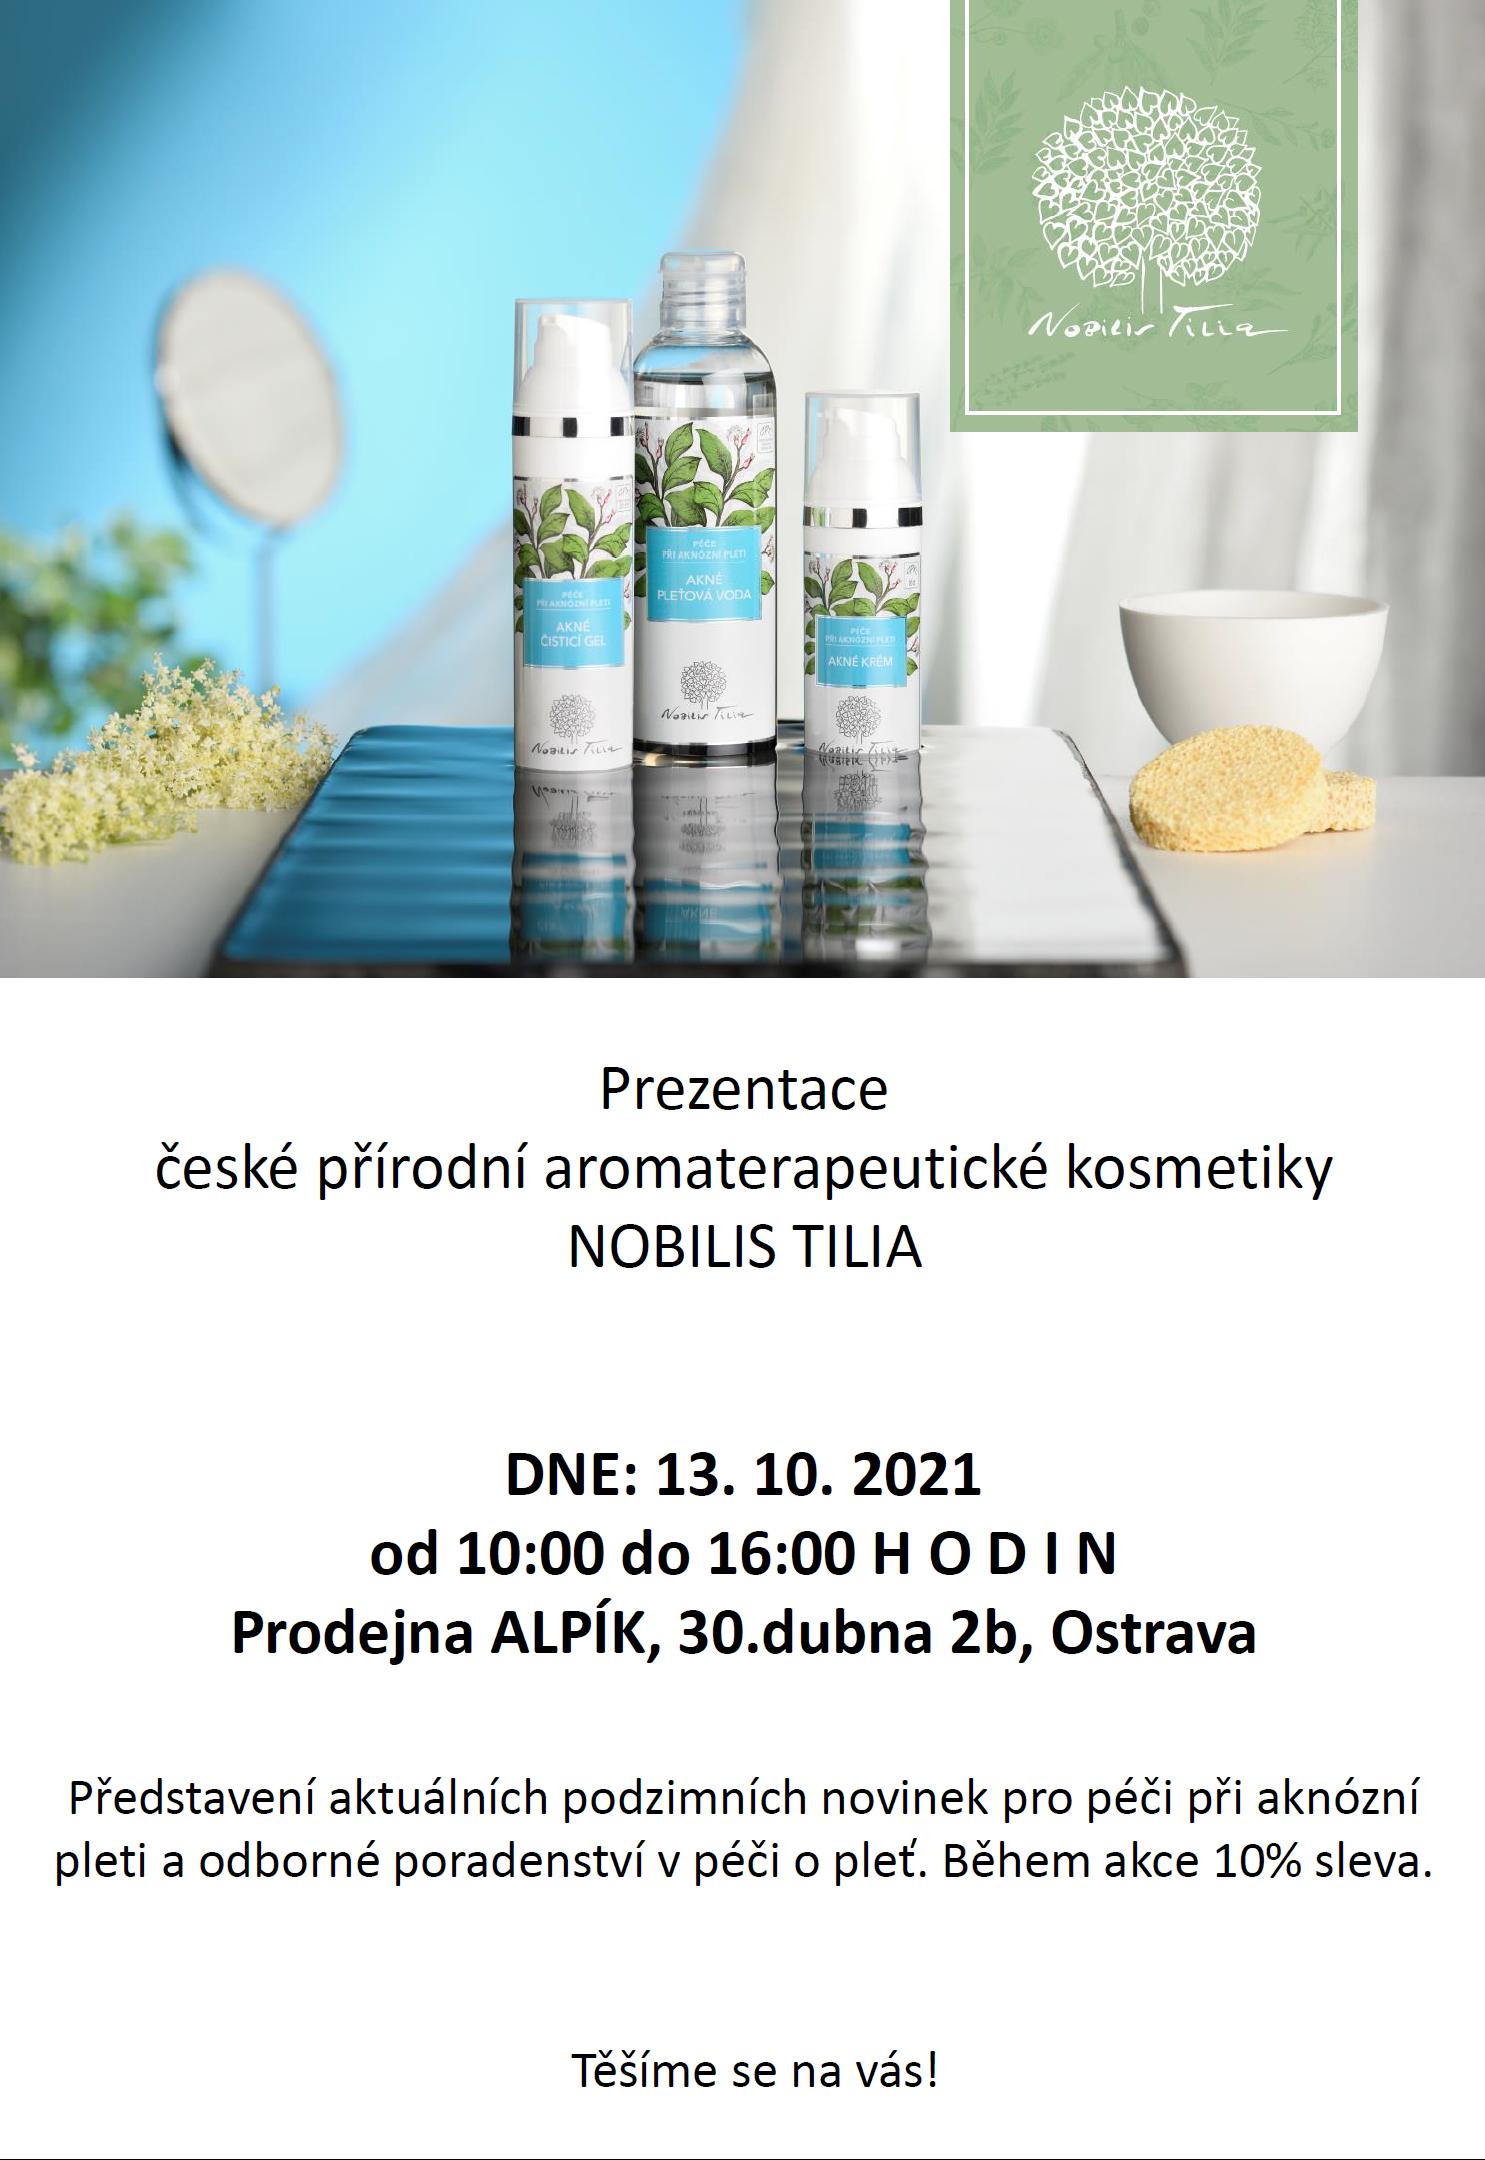 Pozvánka - Akce s Nobils Tilia v Alpik.cz